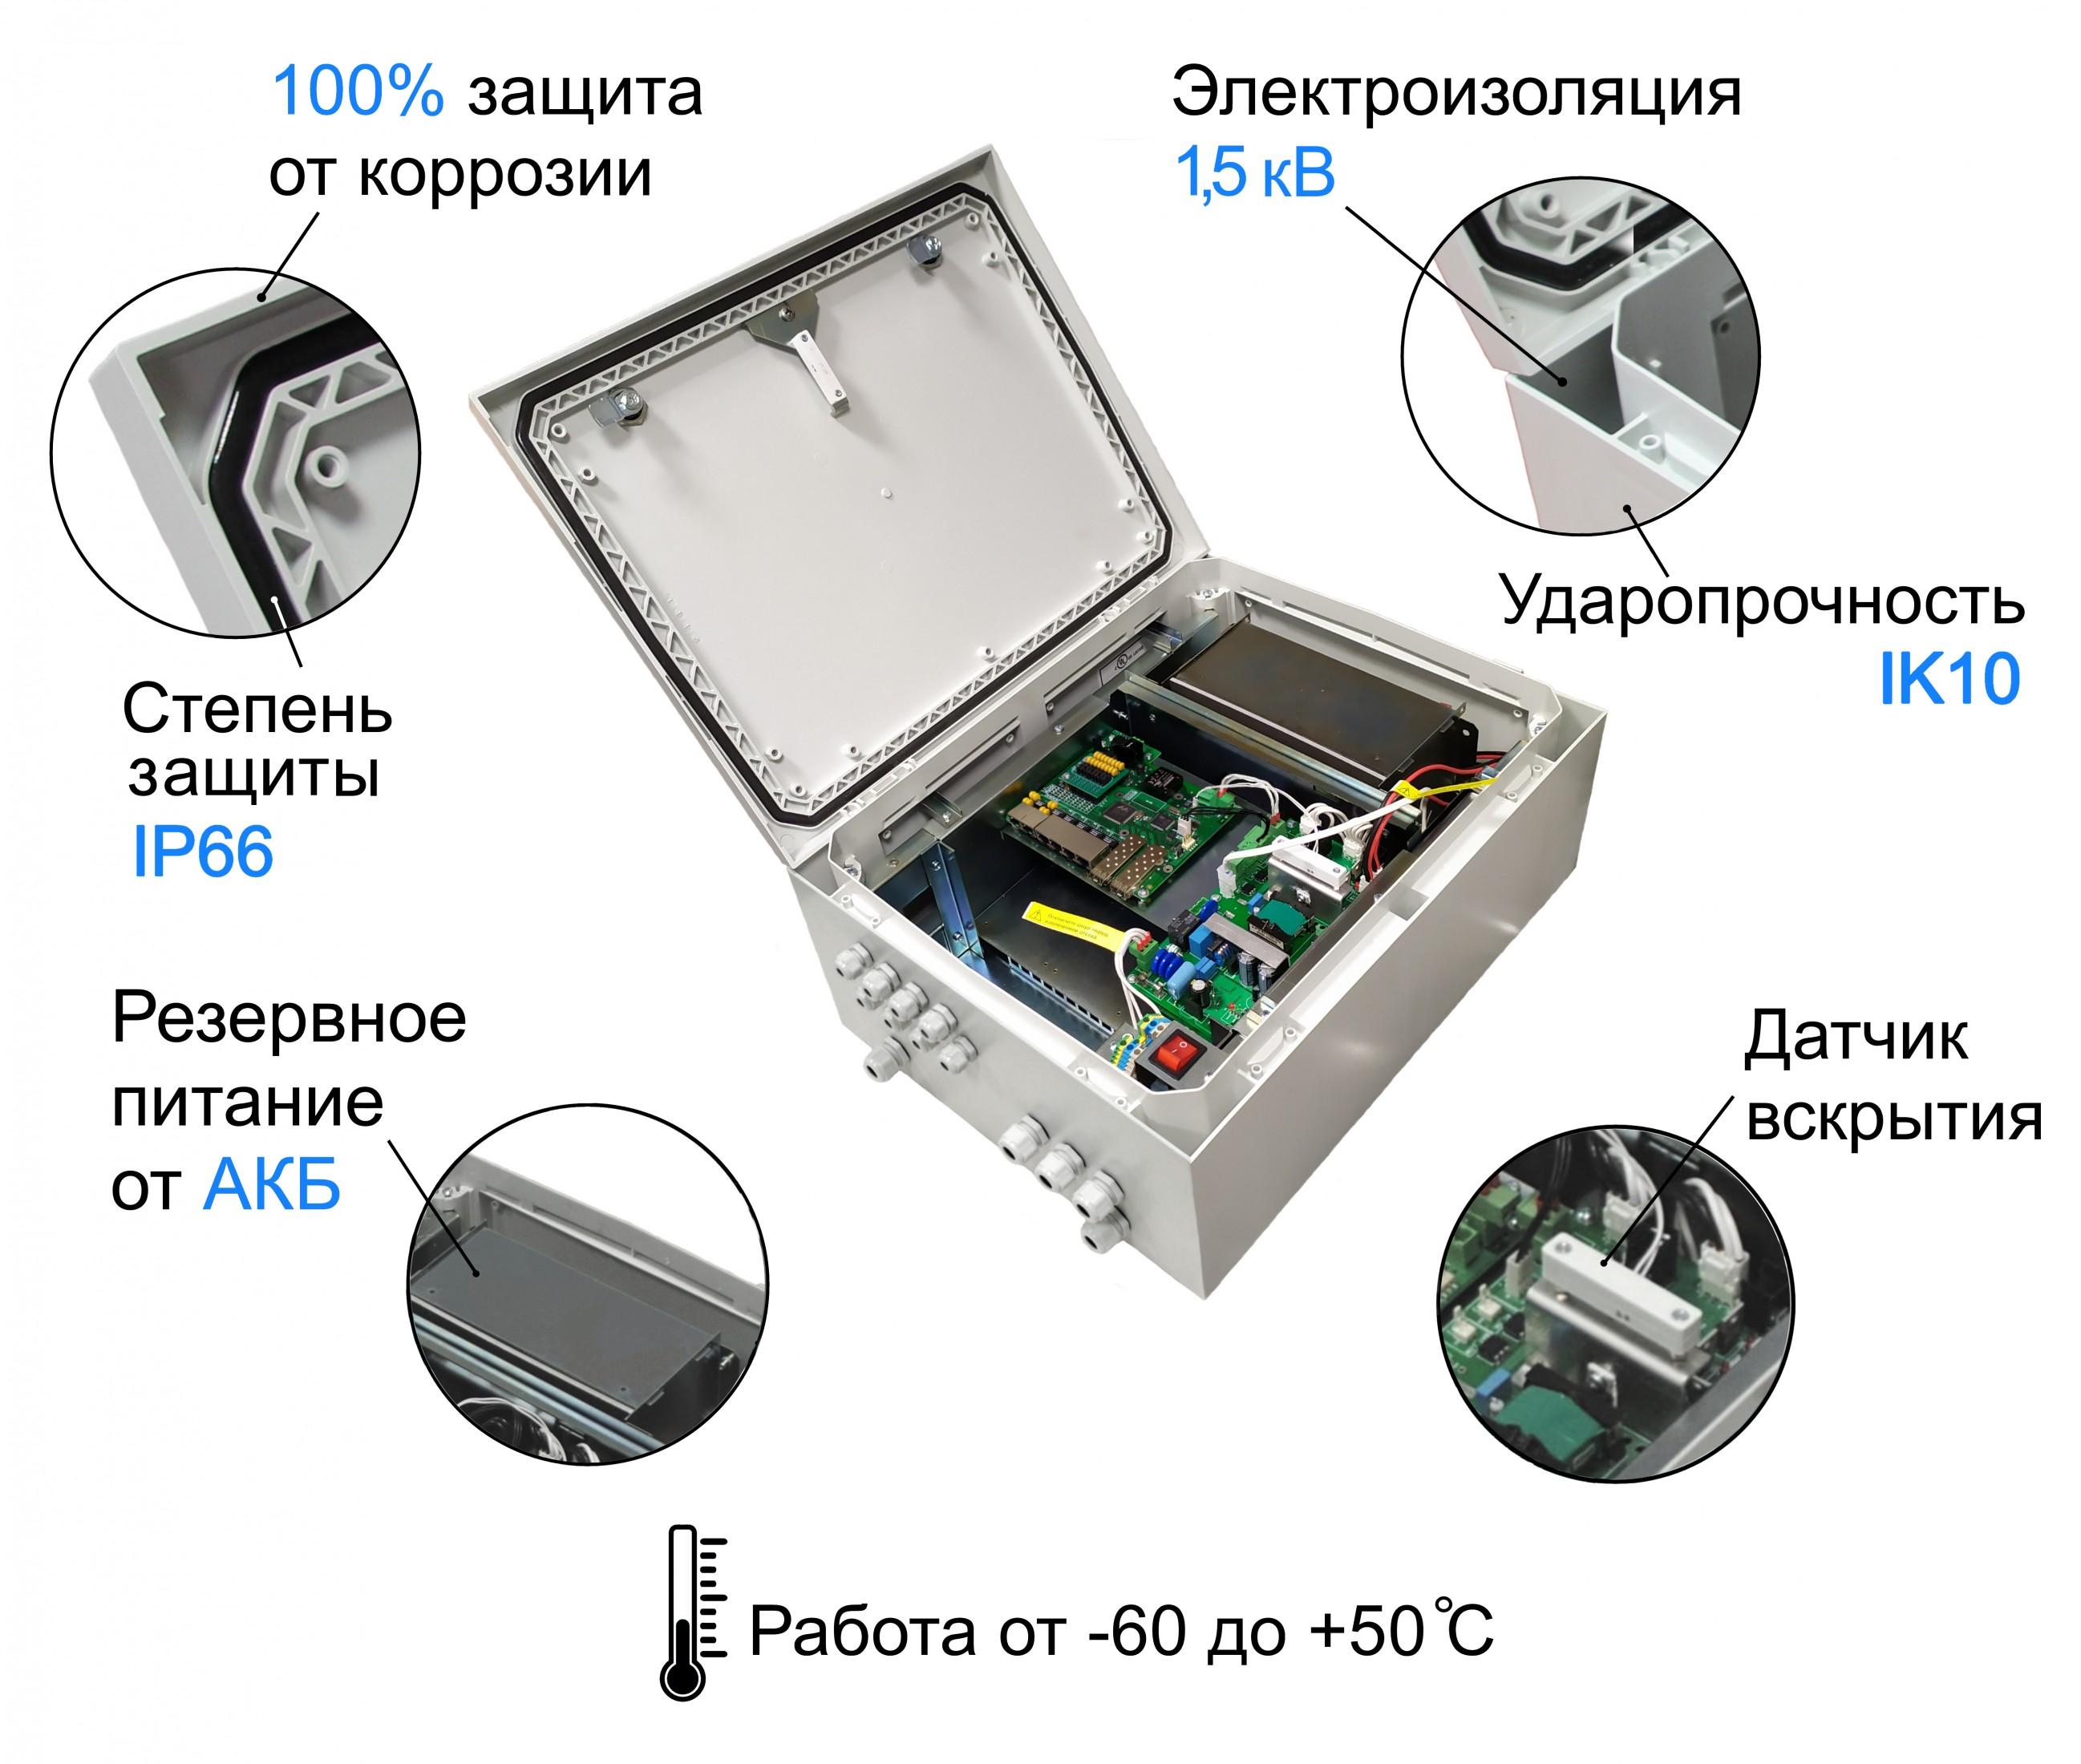 Коммутатор TFortis PSW-2G6F+UPS-Box - Акрон-СБ